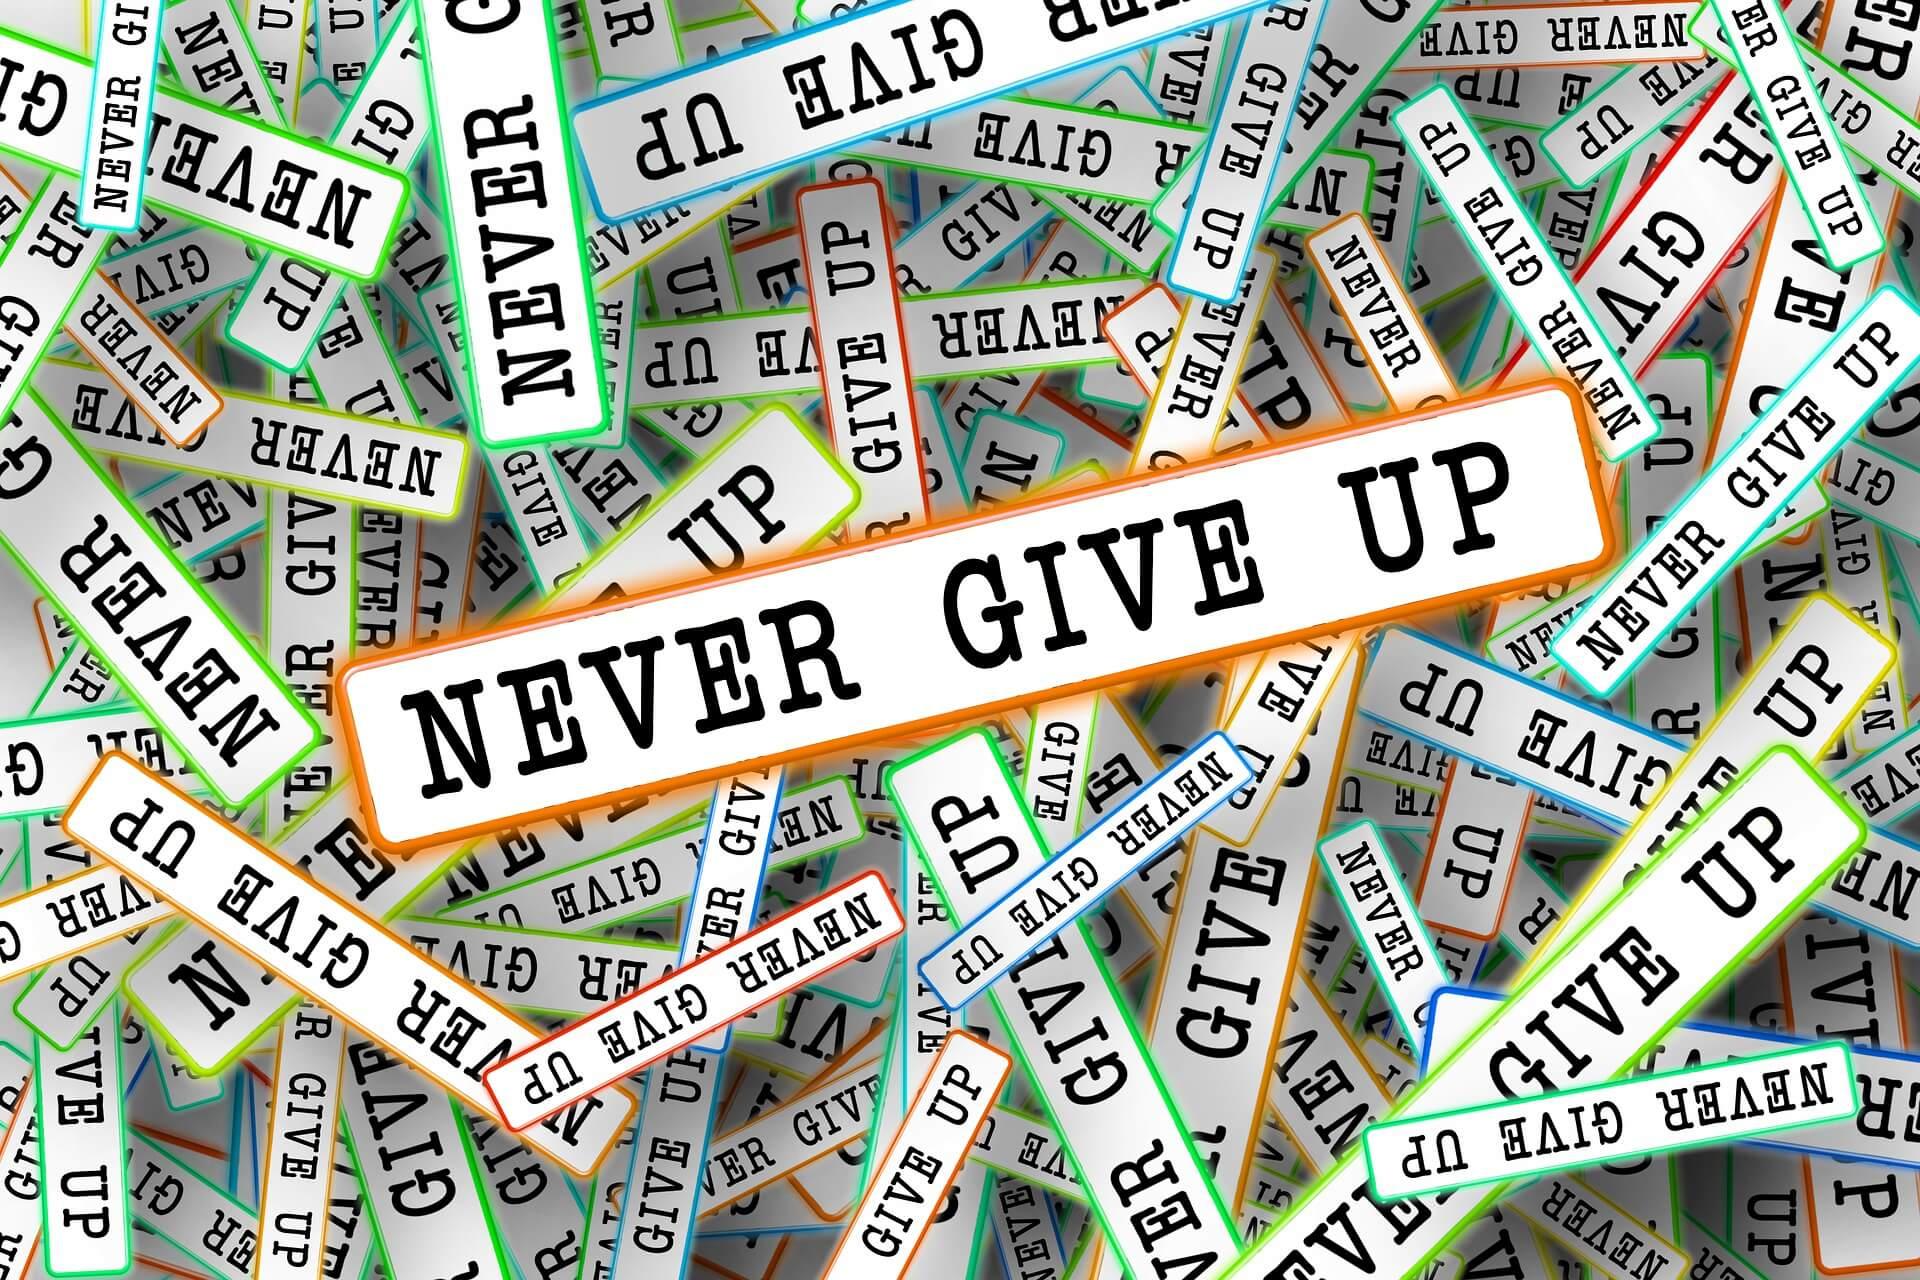 Ne pas abandonner